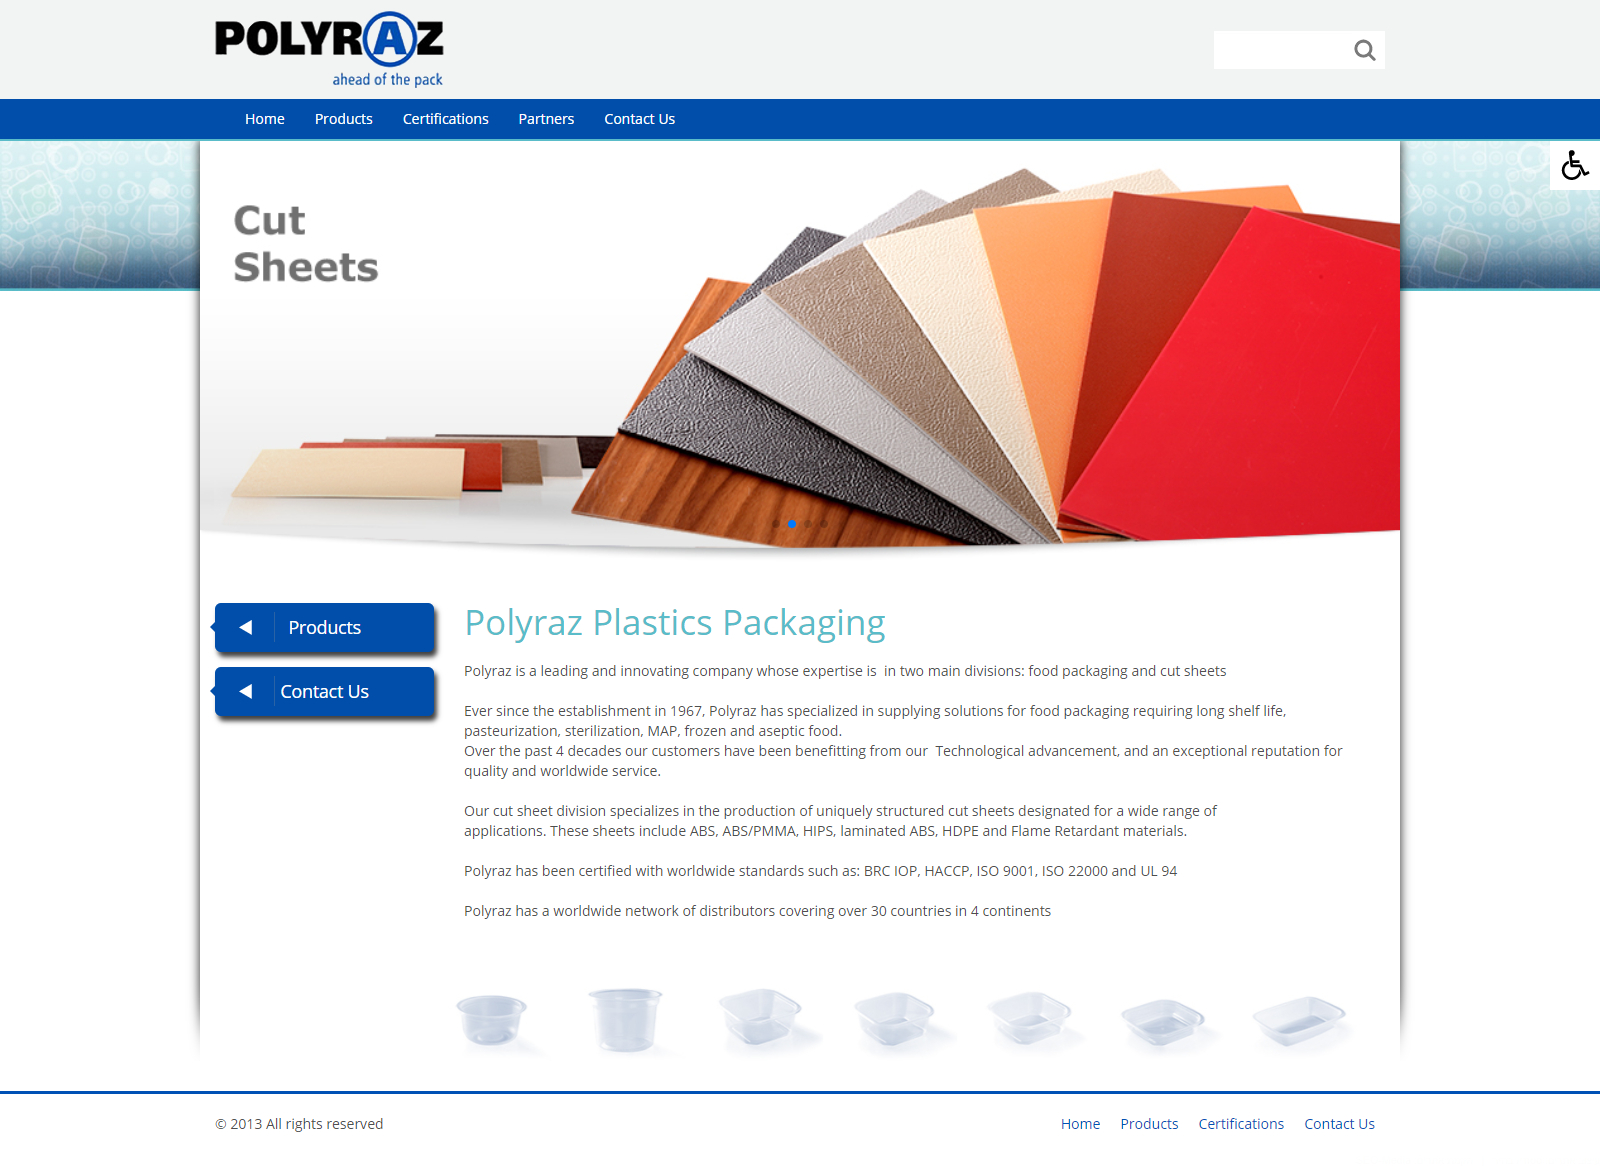 Polyraz Plastics Packaging - Ahead of the pack